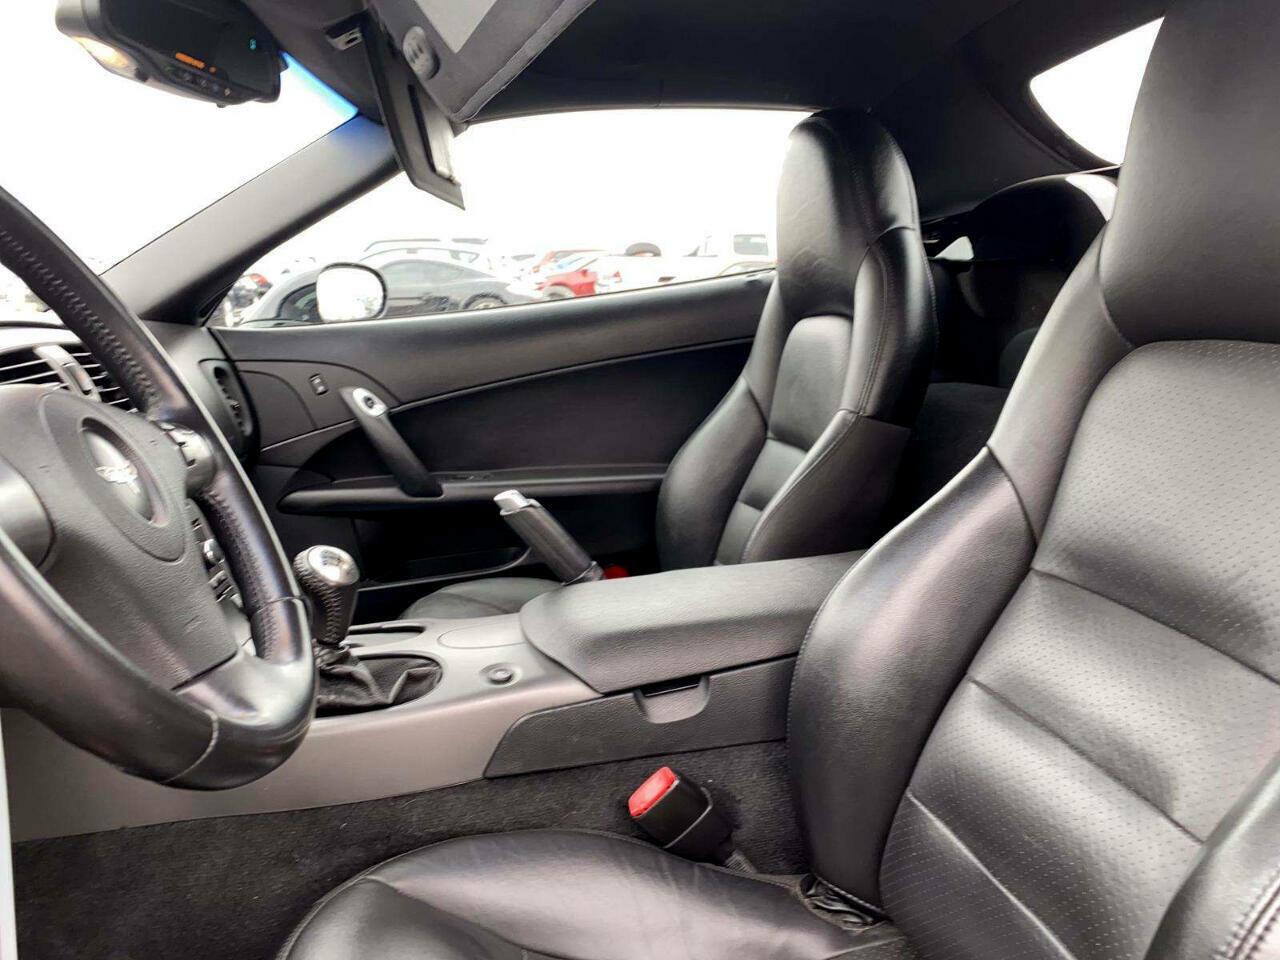 2007 Black Chevrolet Corvette Convertible    C6 Corvette Photo 7